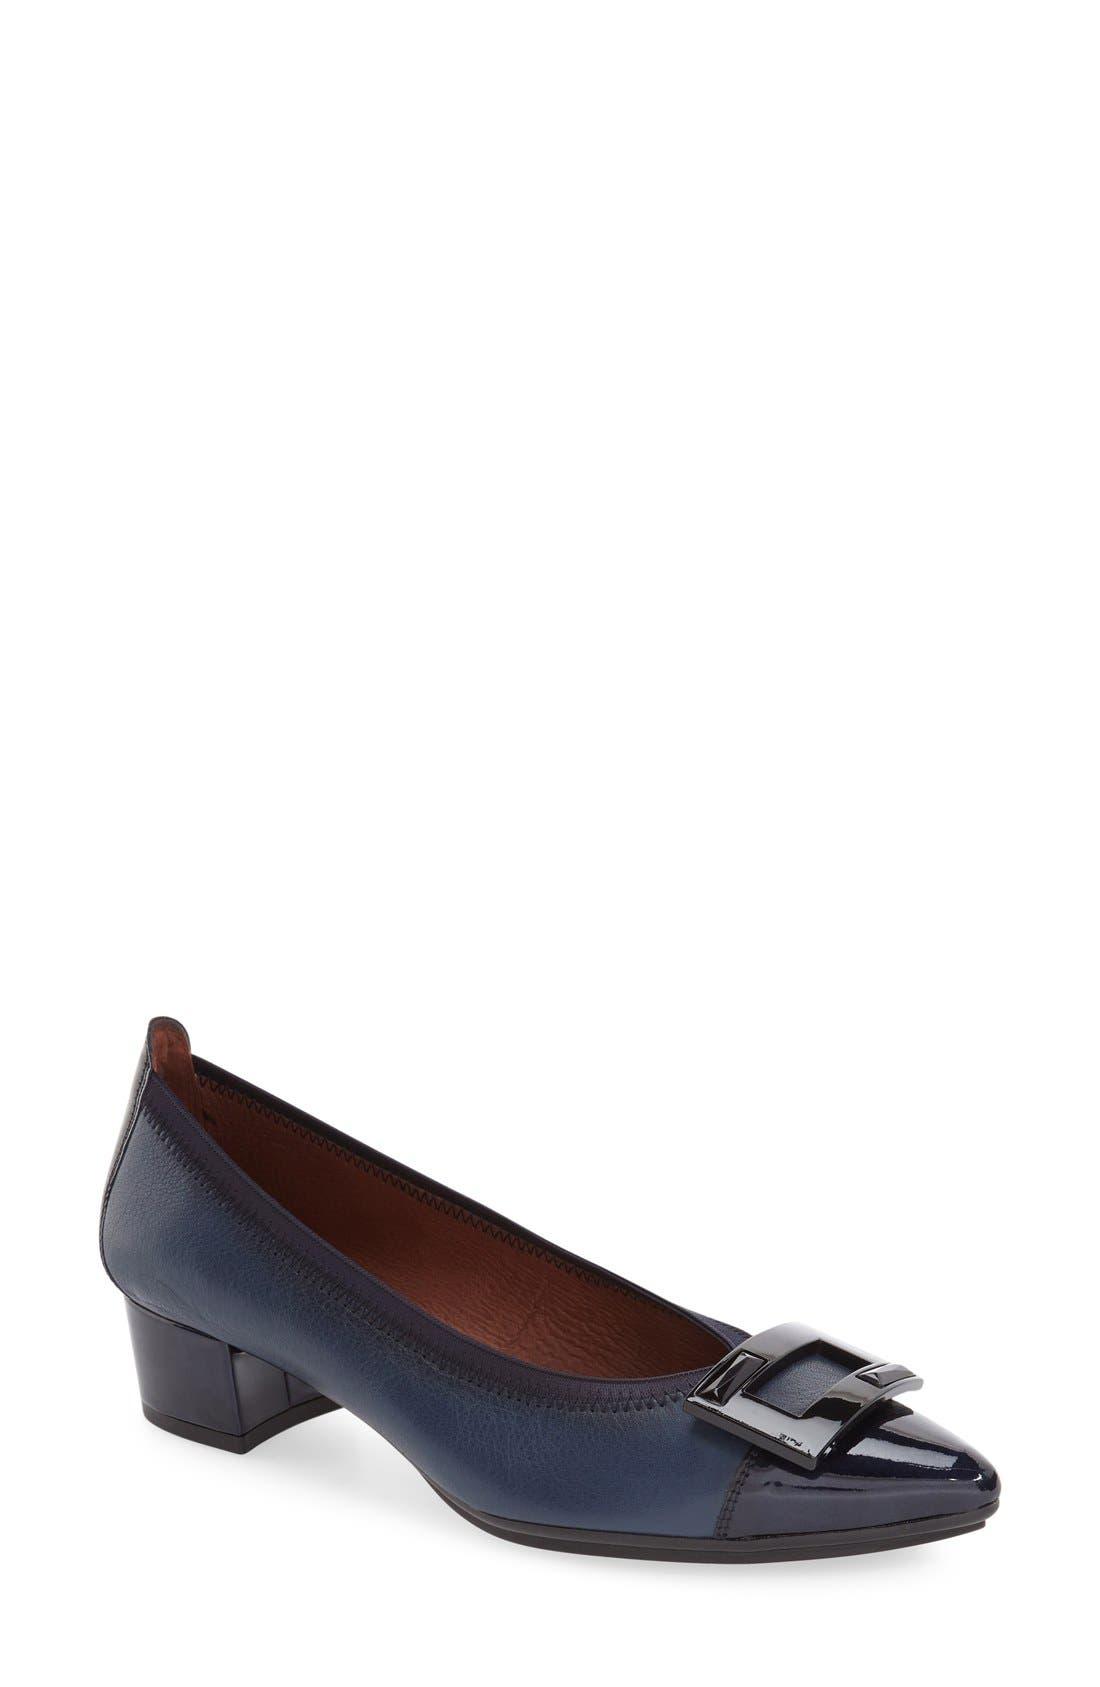 Hispanitas Shoes Sale \u0026 Clearance